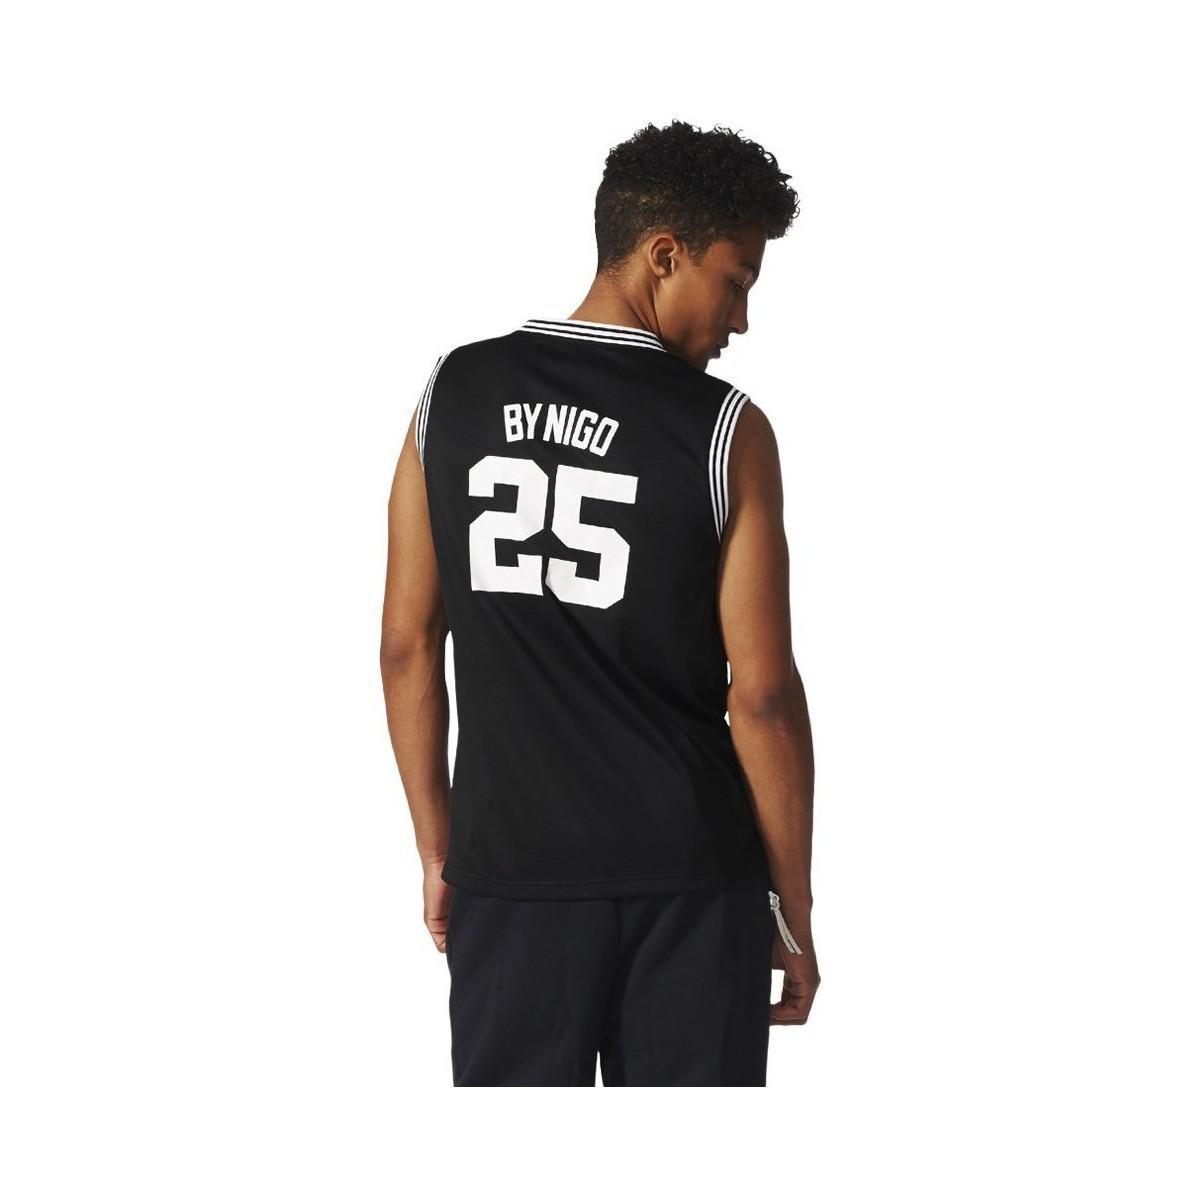 Adidas T Shirts ADIDAS TEAM BASKETBALL JERSEY BLACK VEST